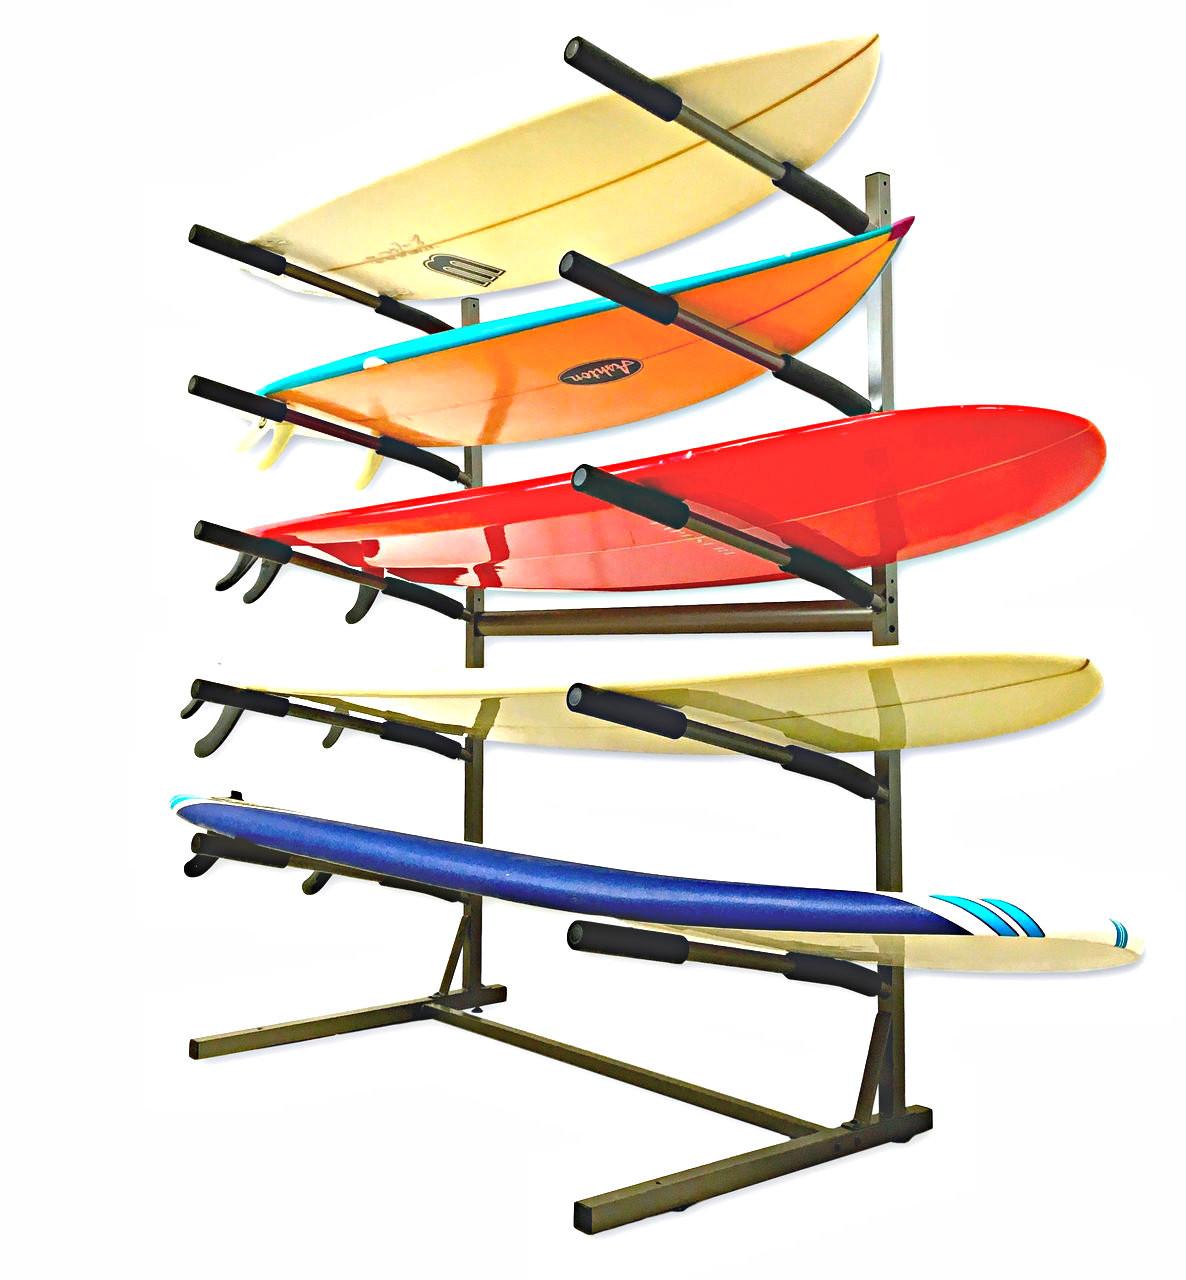 Freestanding Surf Rack | Holds 5 Surfboards